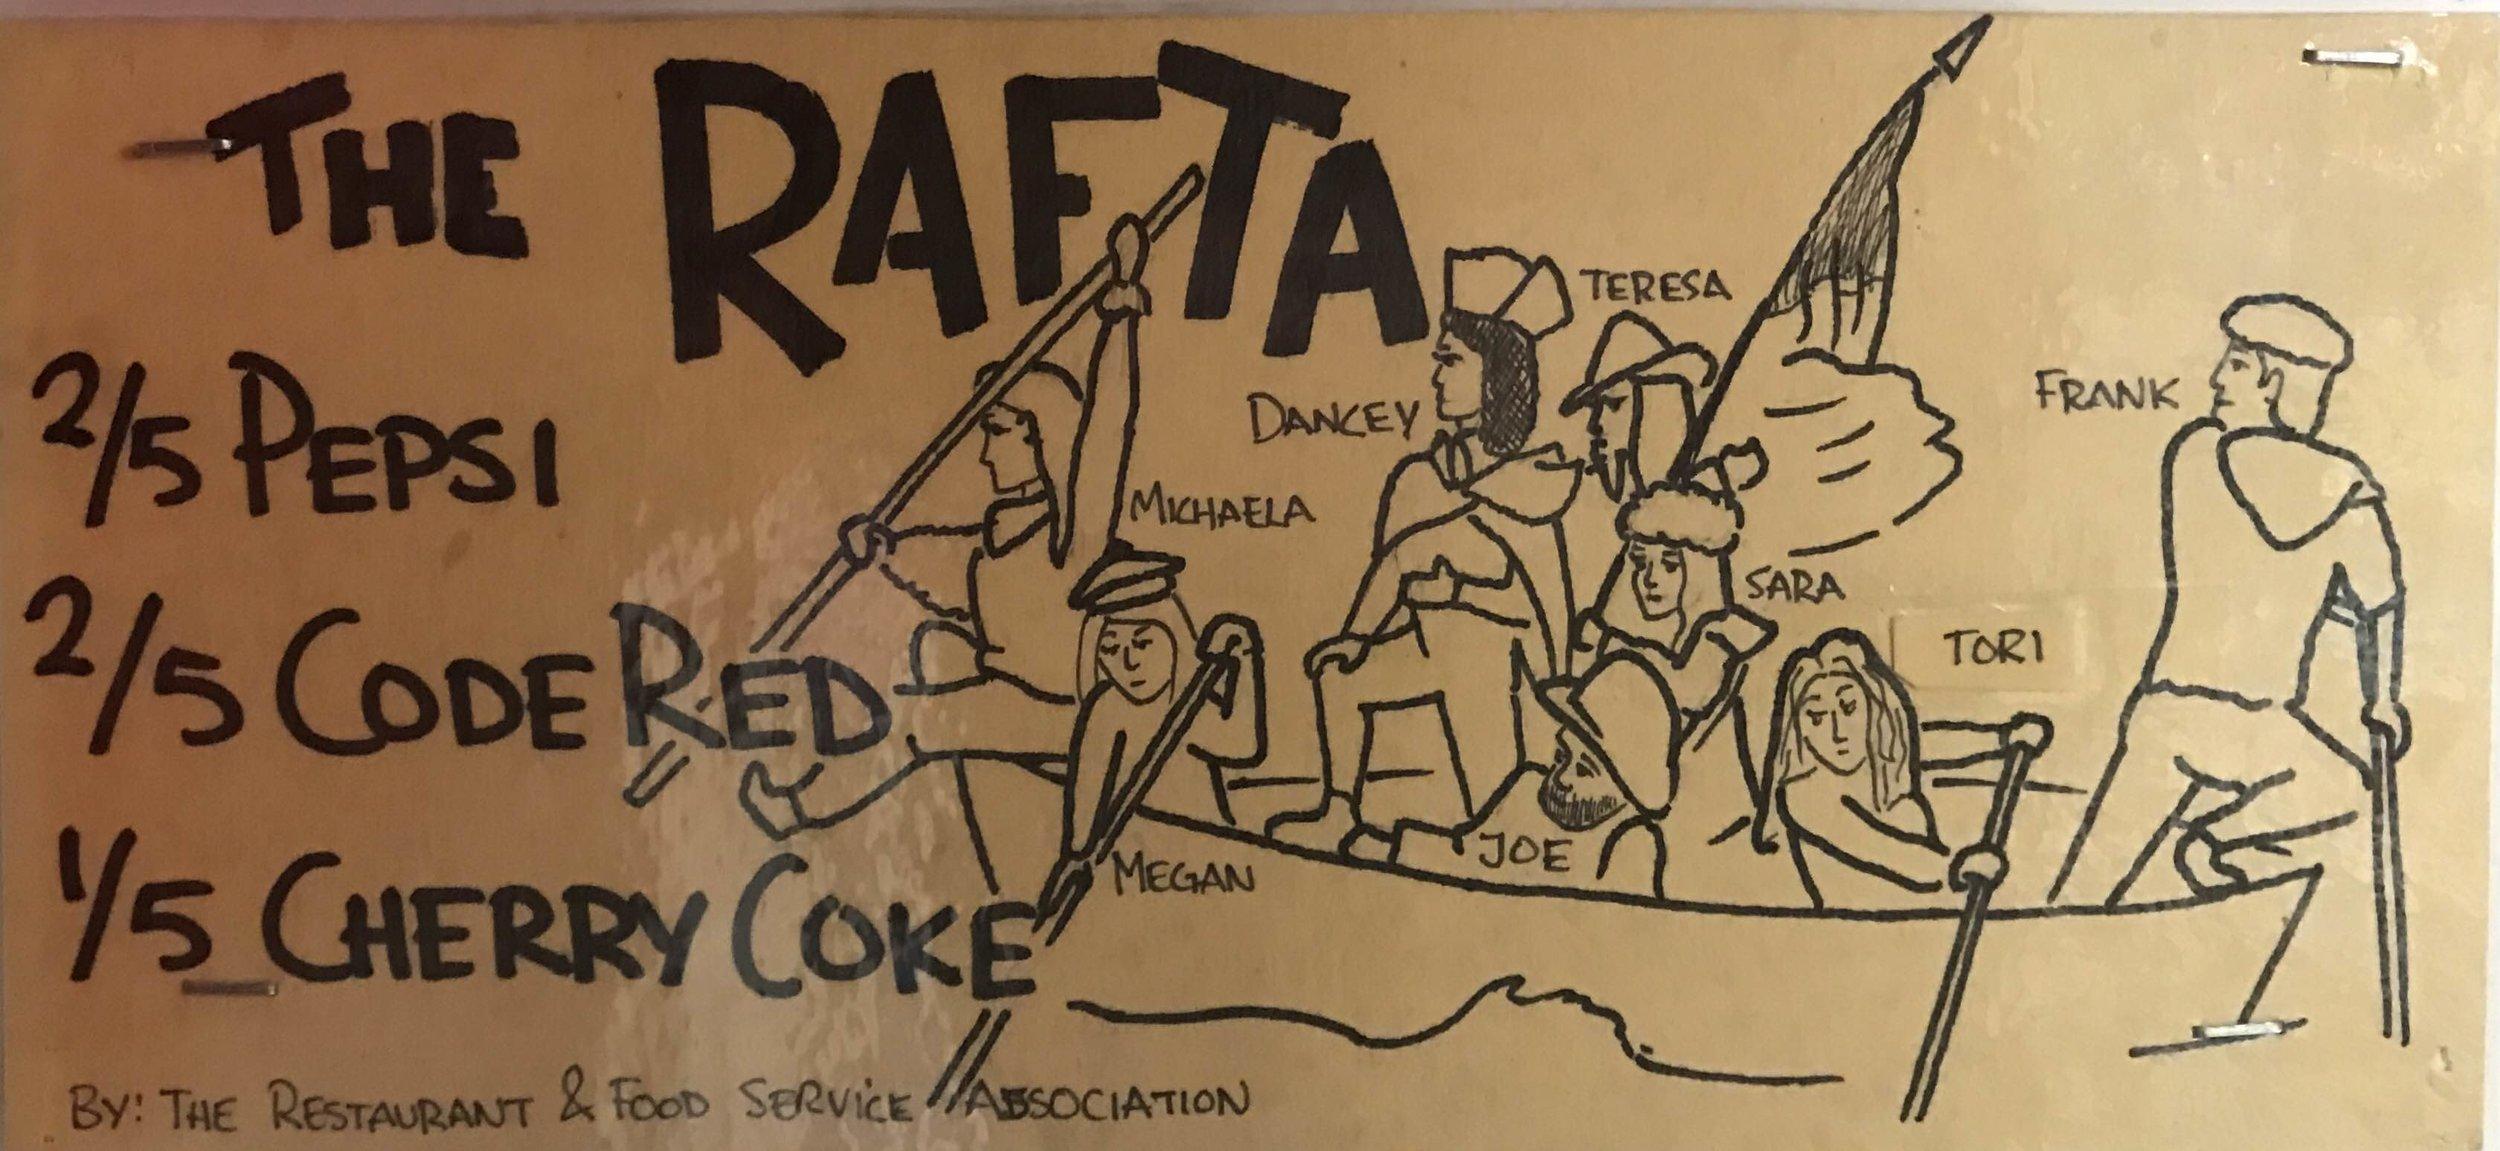 The Rafta.JPG